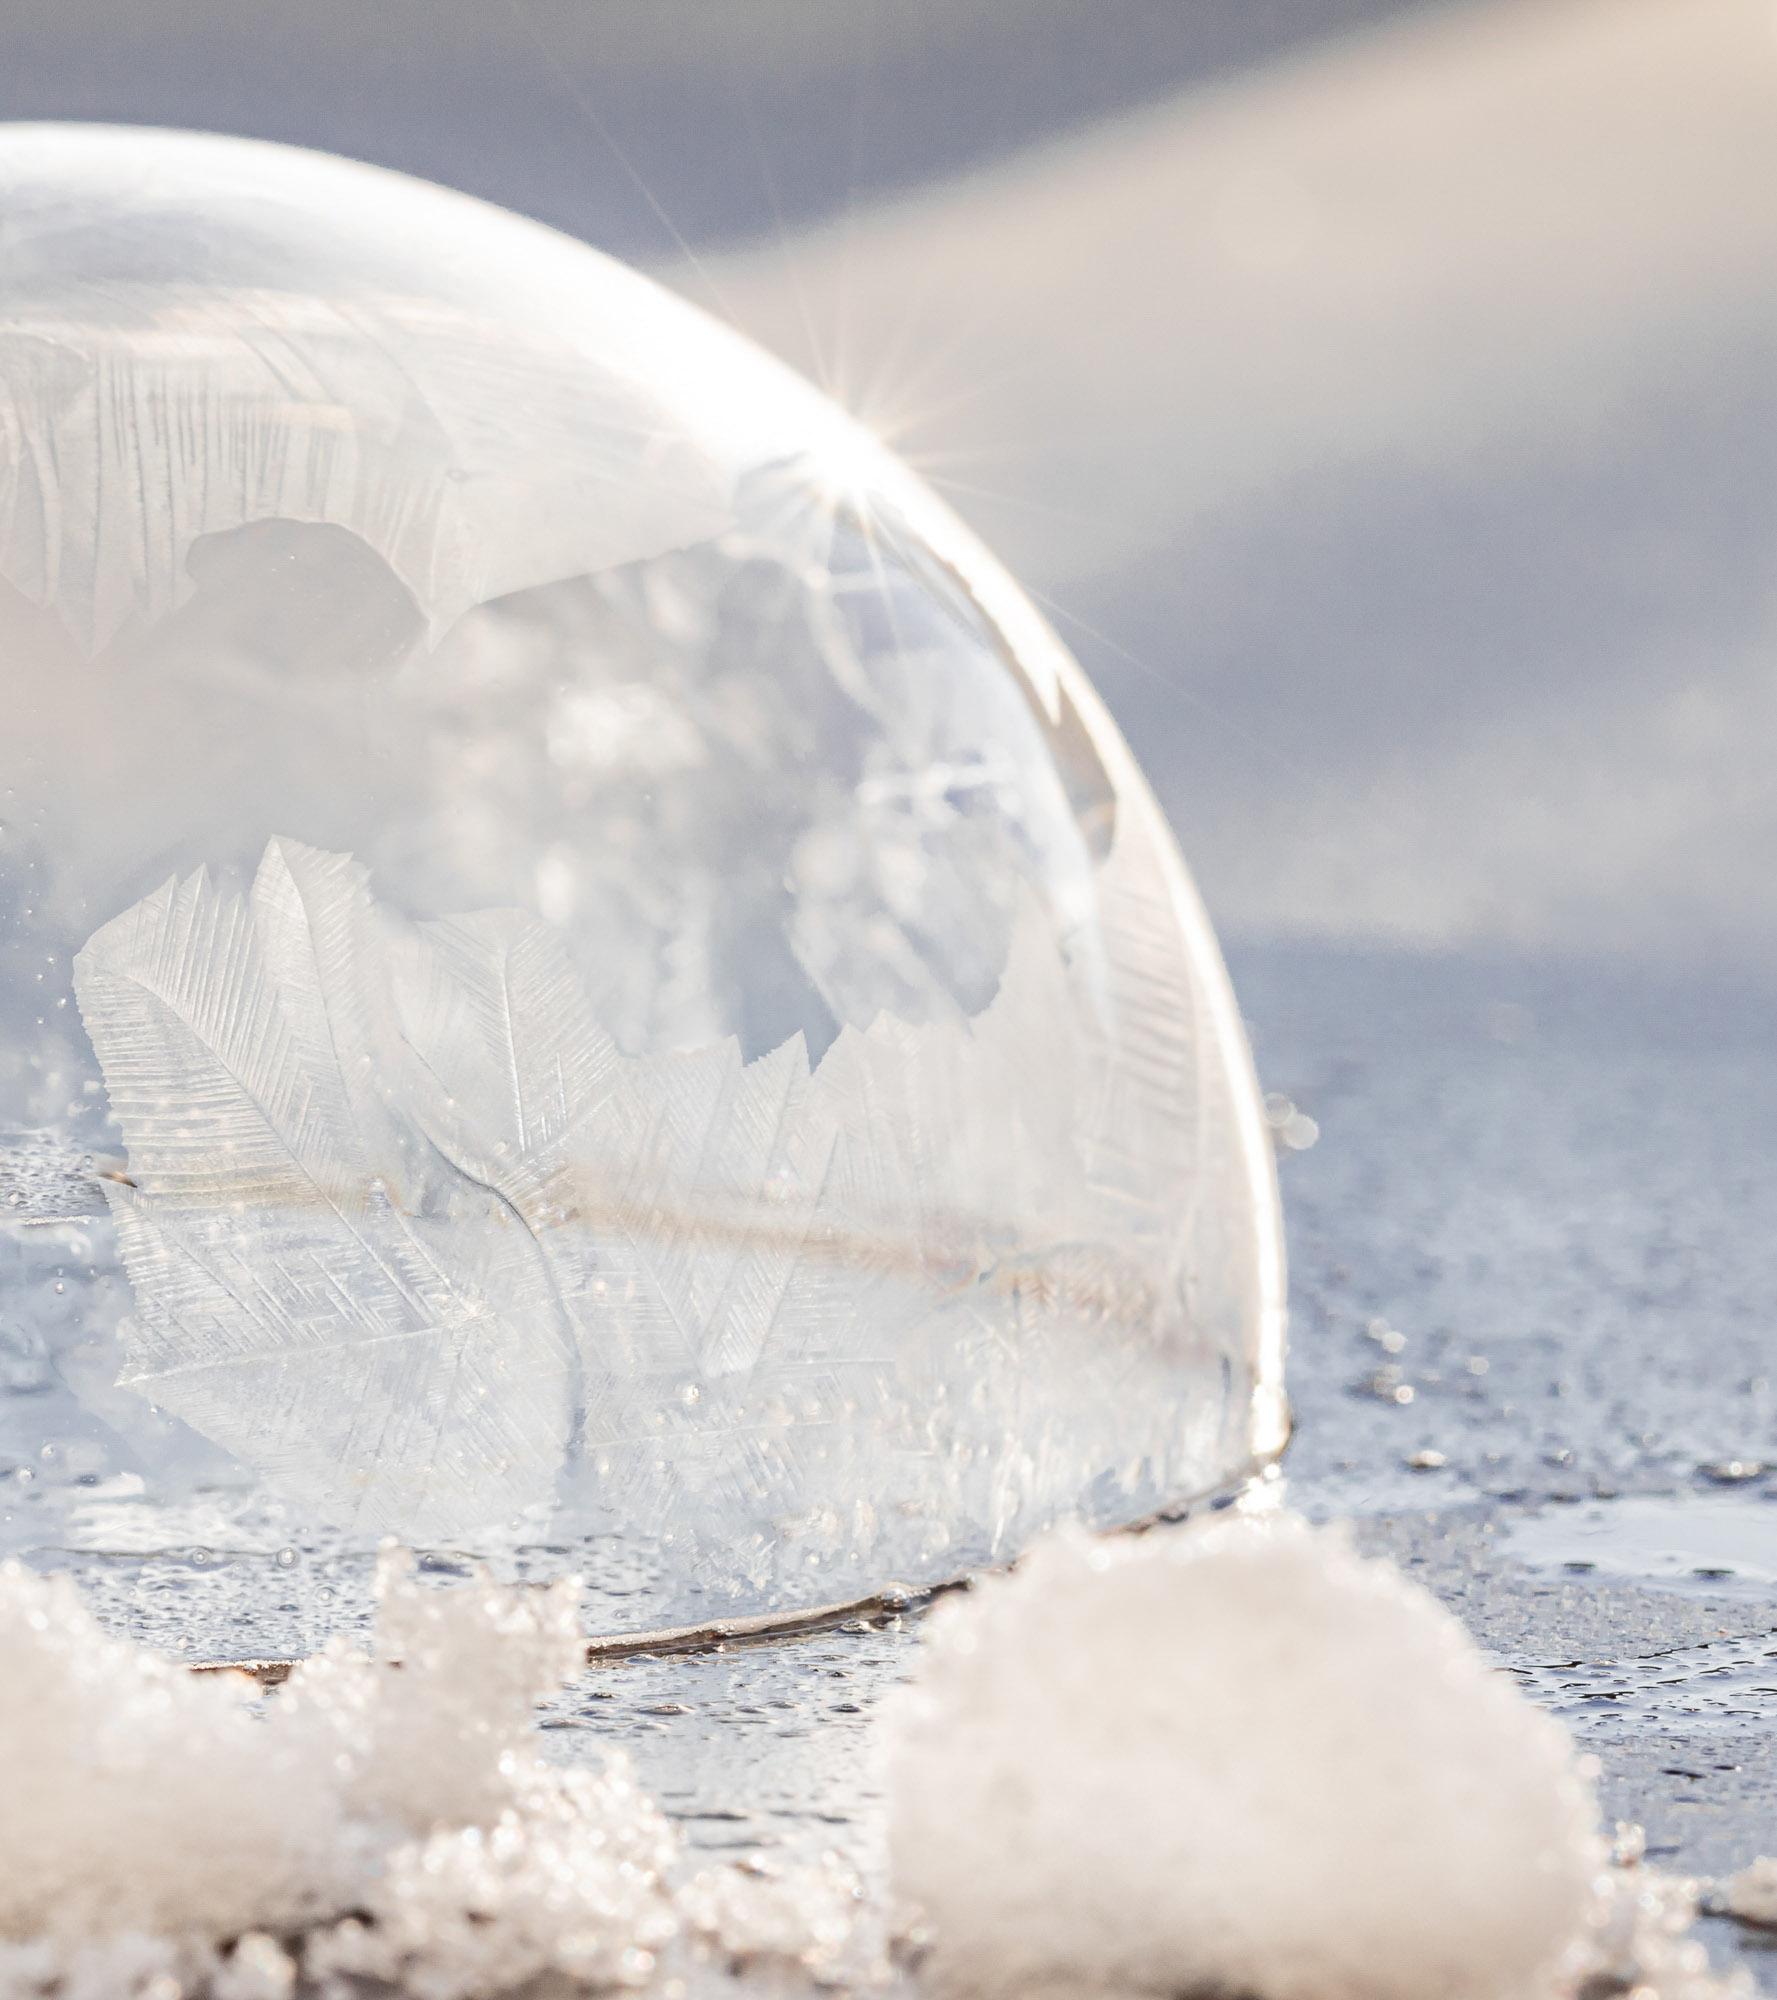 Seifenblasenpfützen